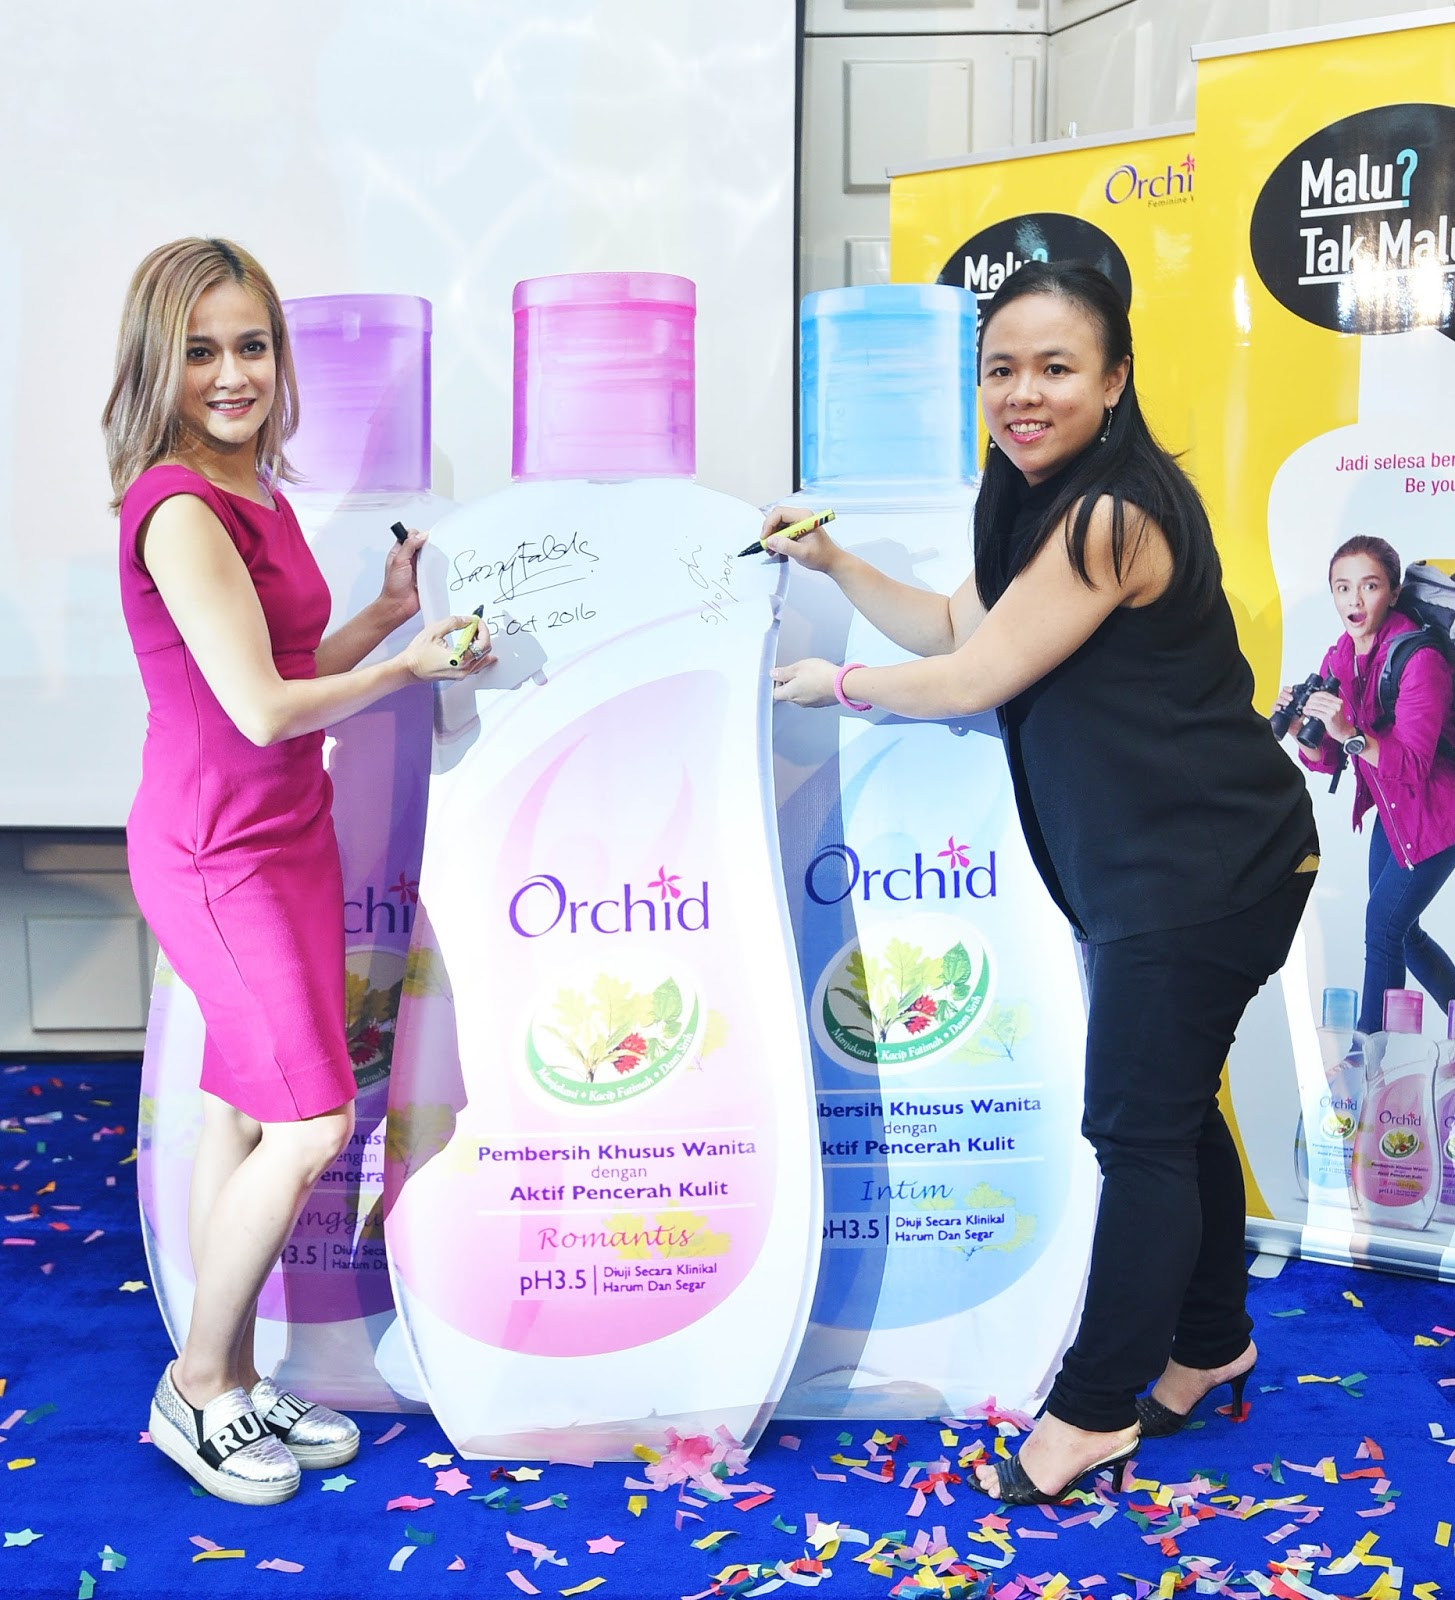 Orchid Introduces Sazzy Falak As Brand Ambassador Kick Starts Feminine Empowerment Campaign Malu